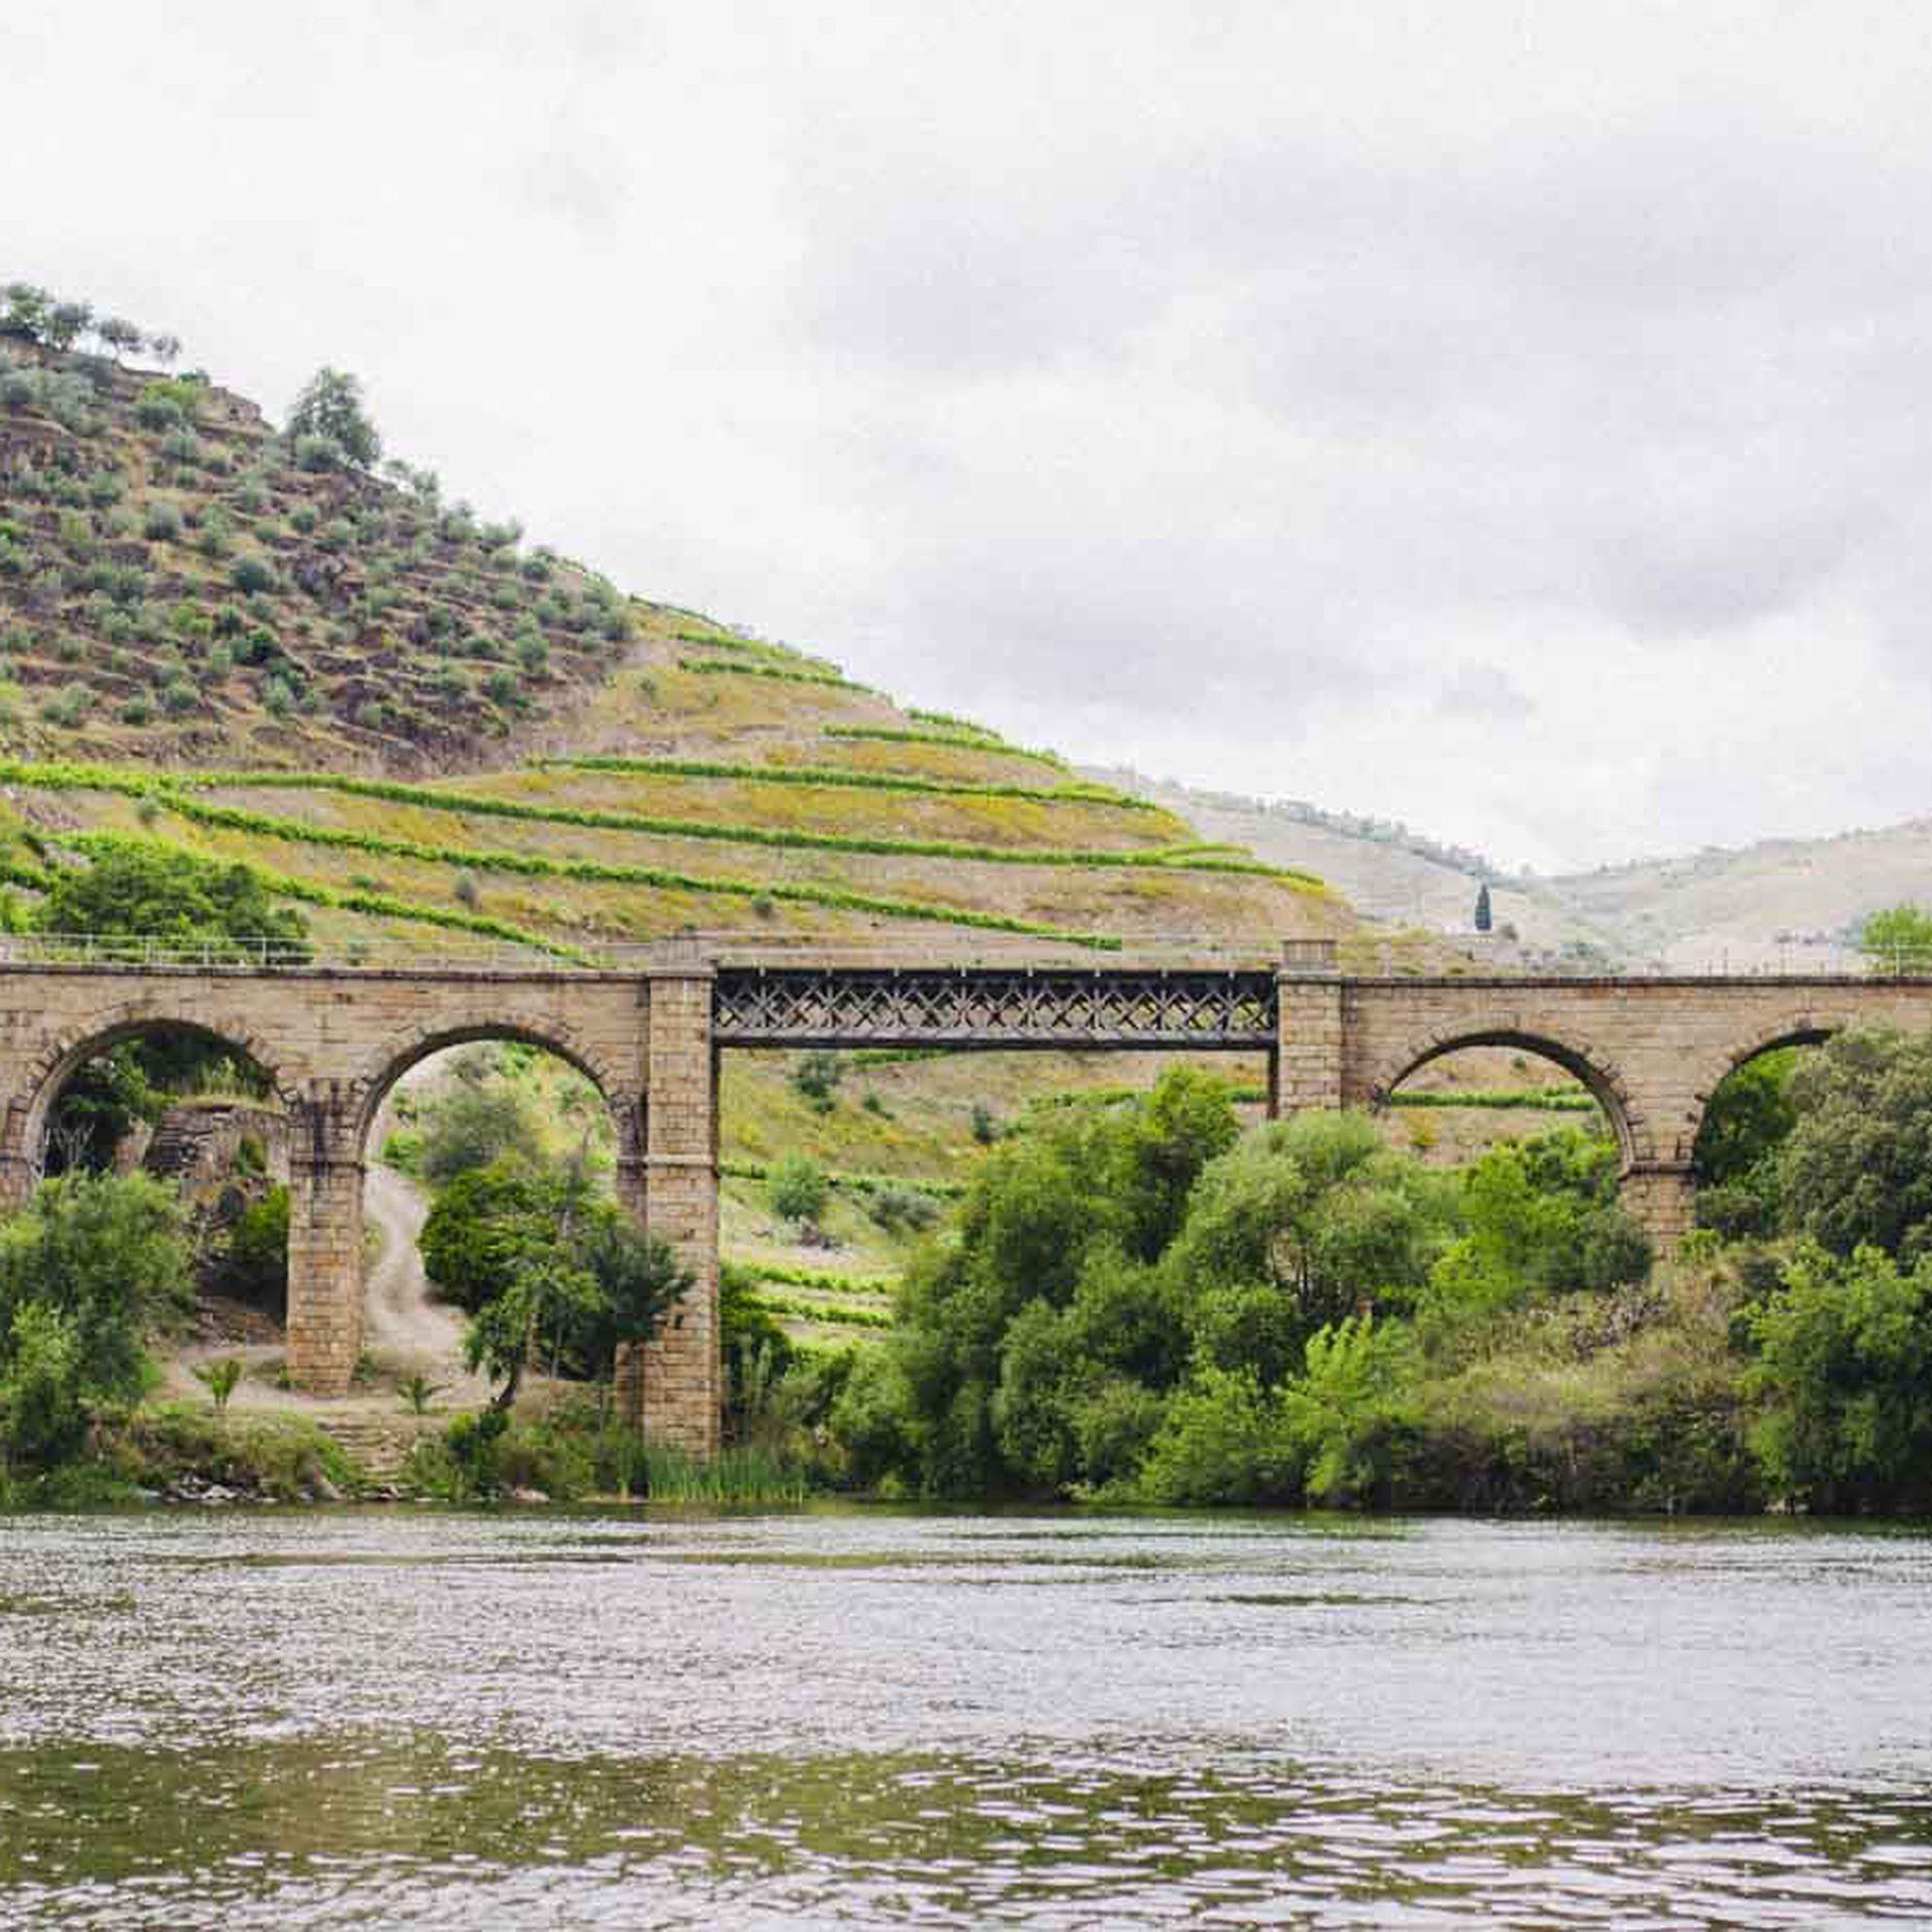 Tim Moore travels Portugal's coastal trains